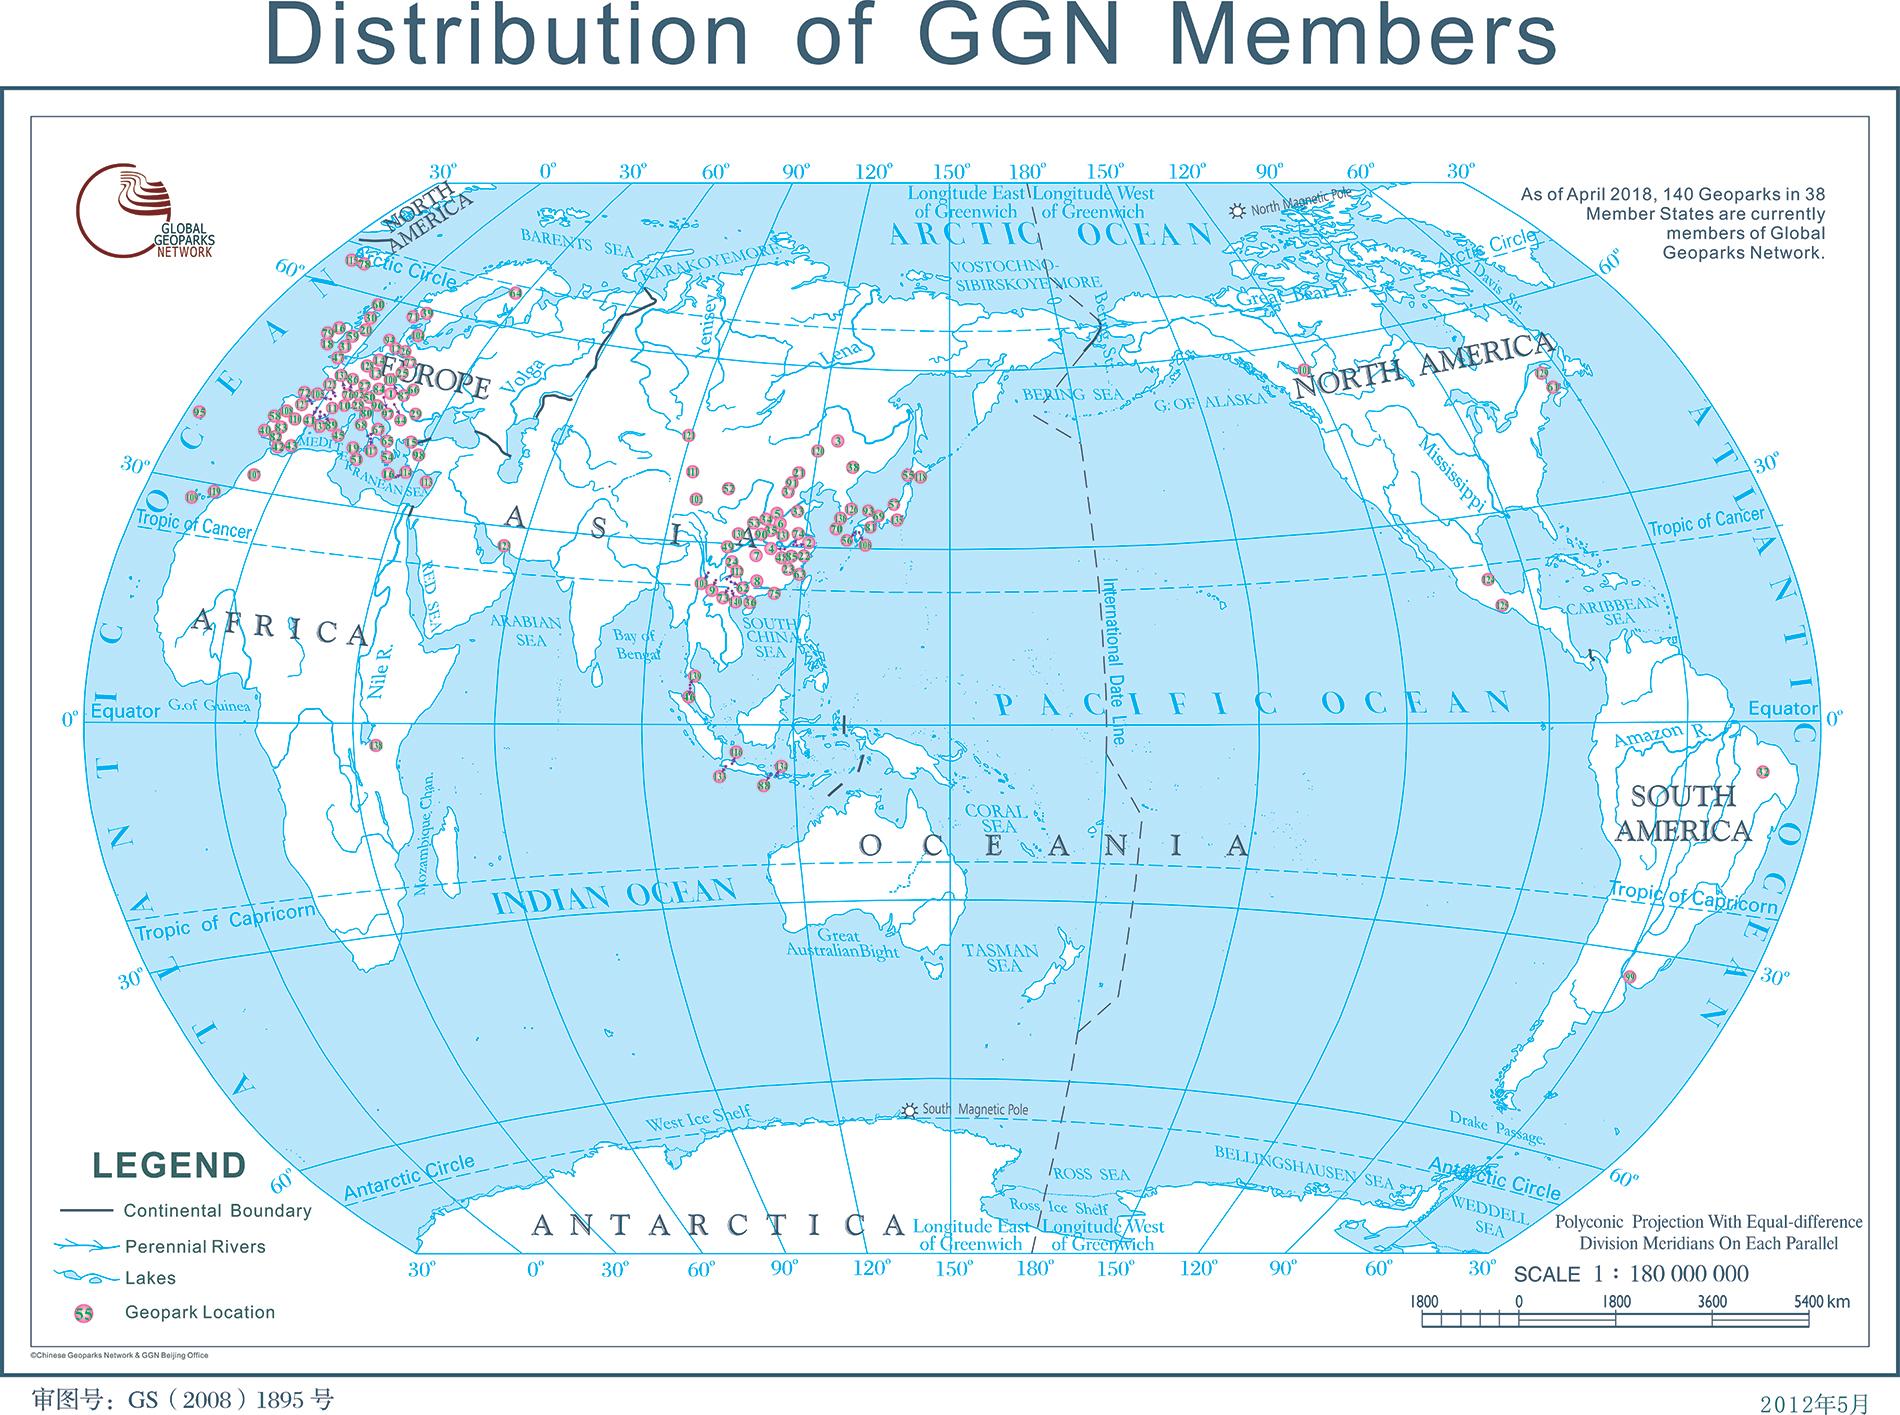 GGN_Distribution_2018_origin